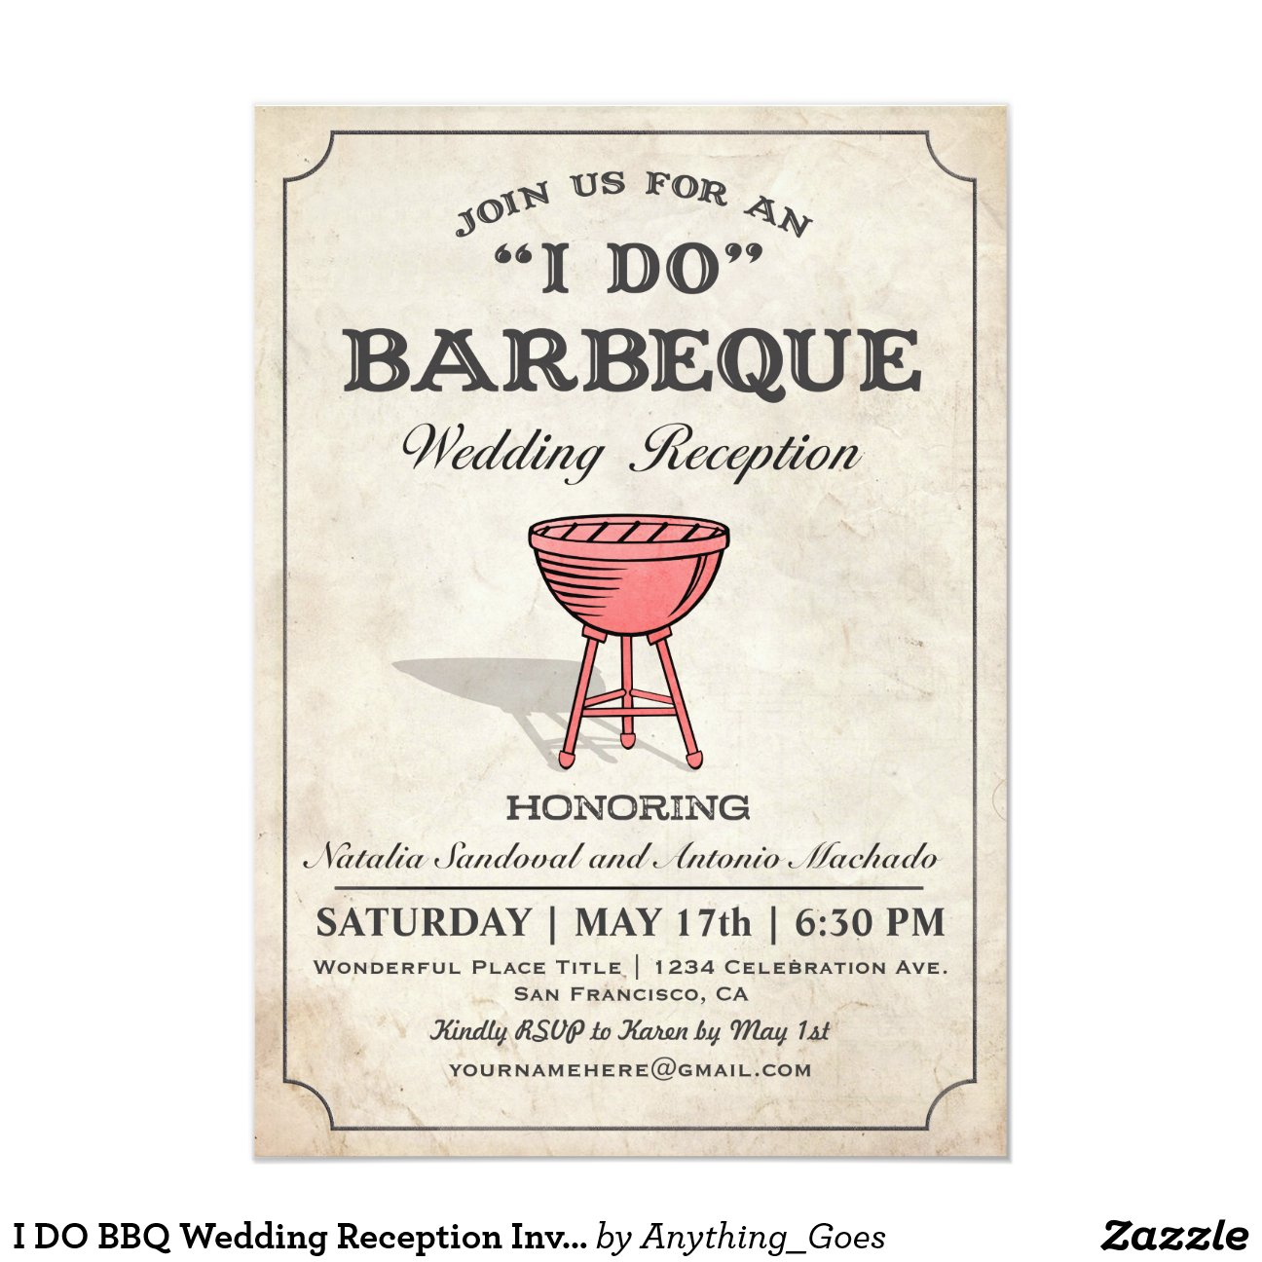 I Do Bbq Wedding Invitations 015 - I Do Bbq Wedding Invitations